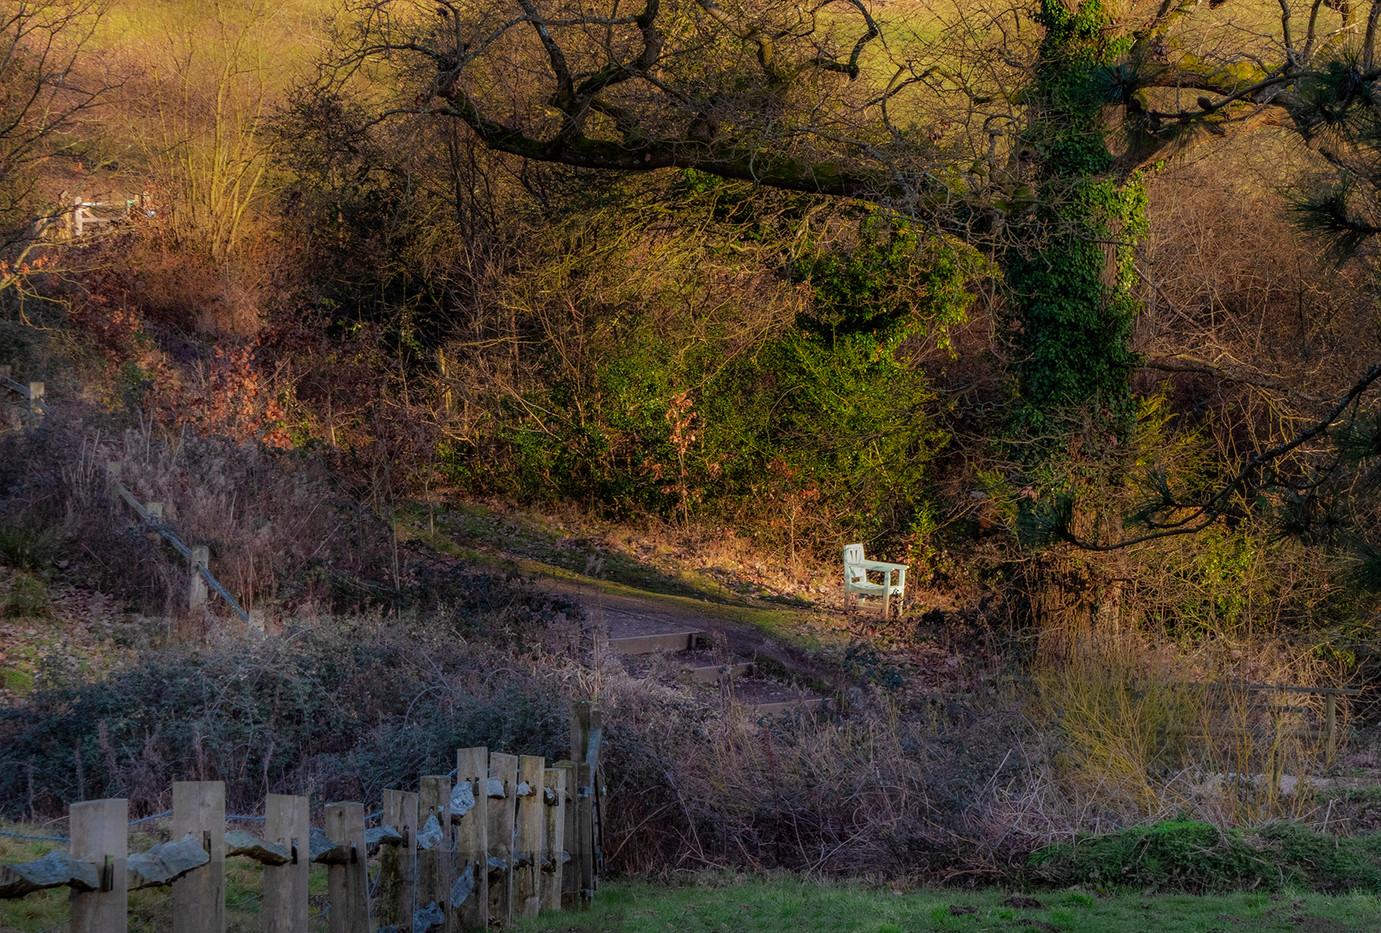 14 SIR WINSTON'S GARDEN (near Chartwell) by Graham Bunyan